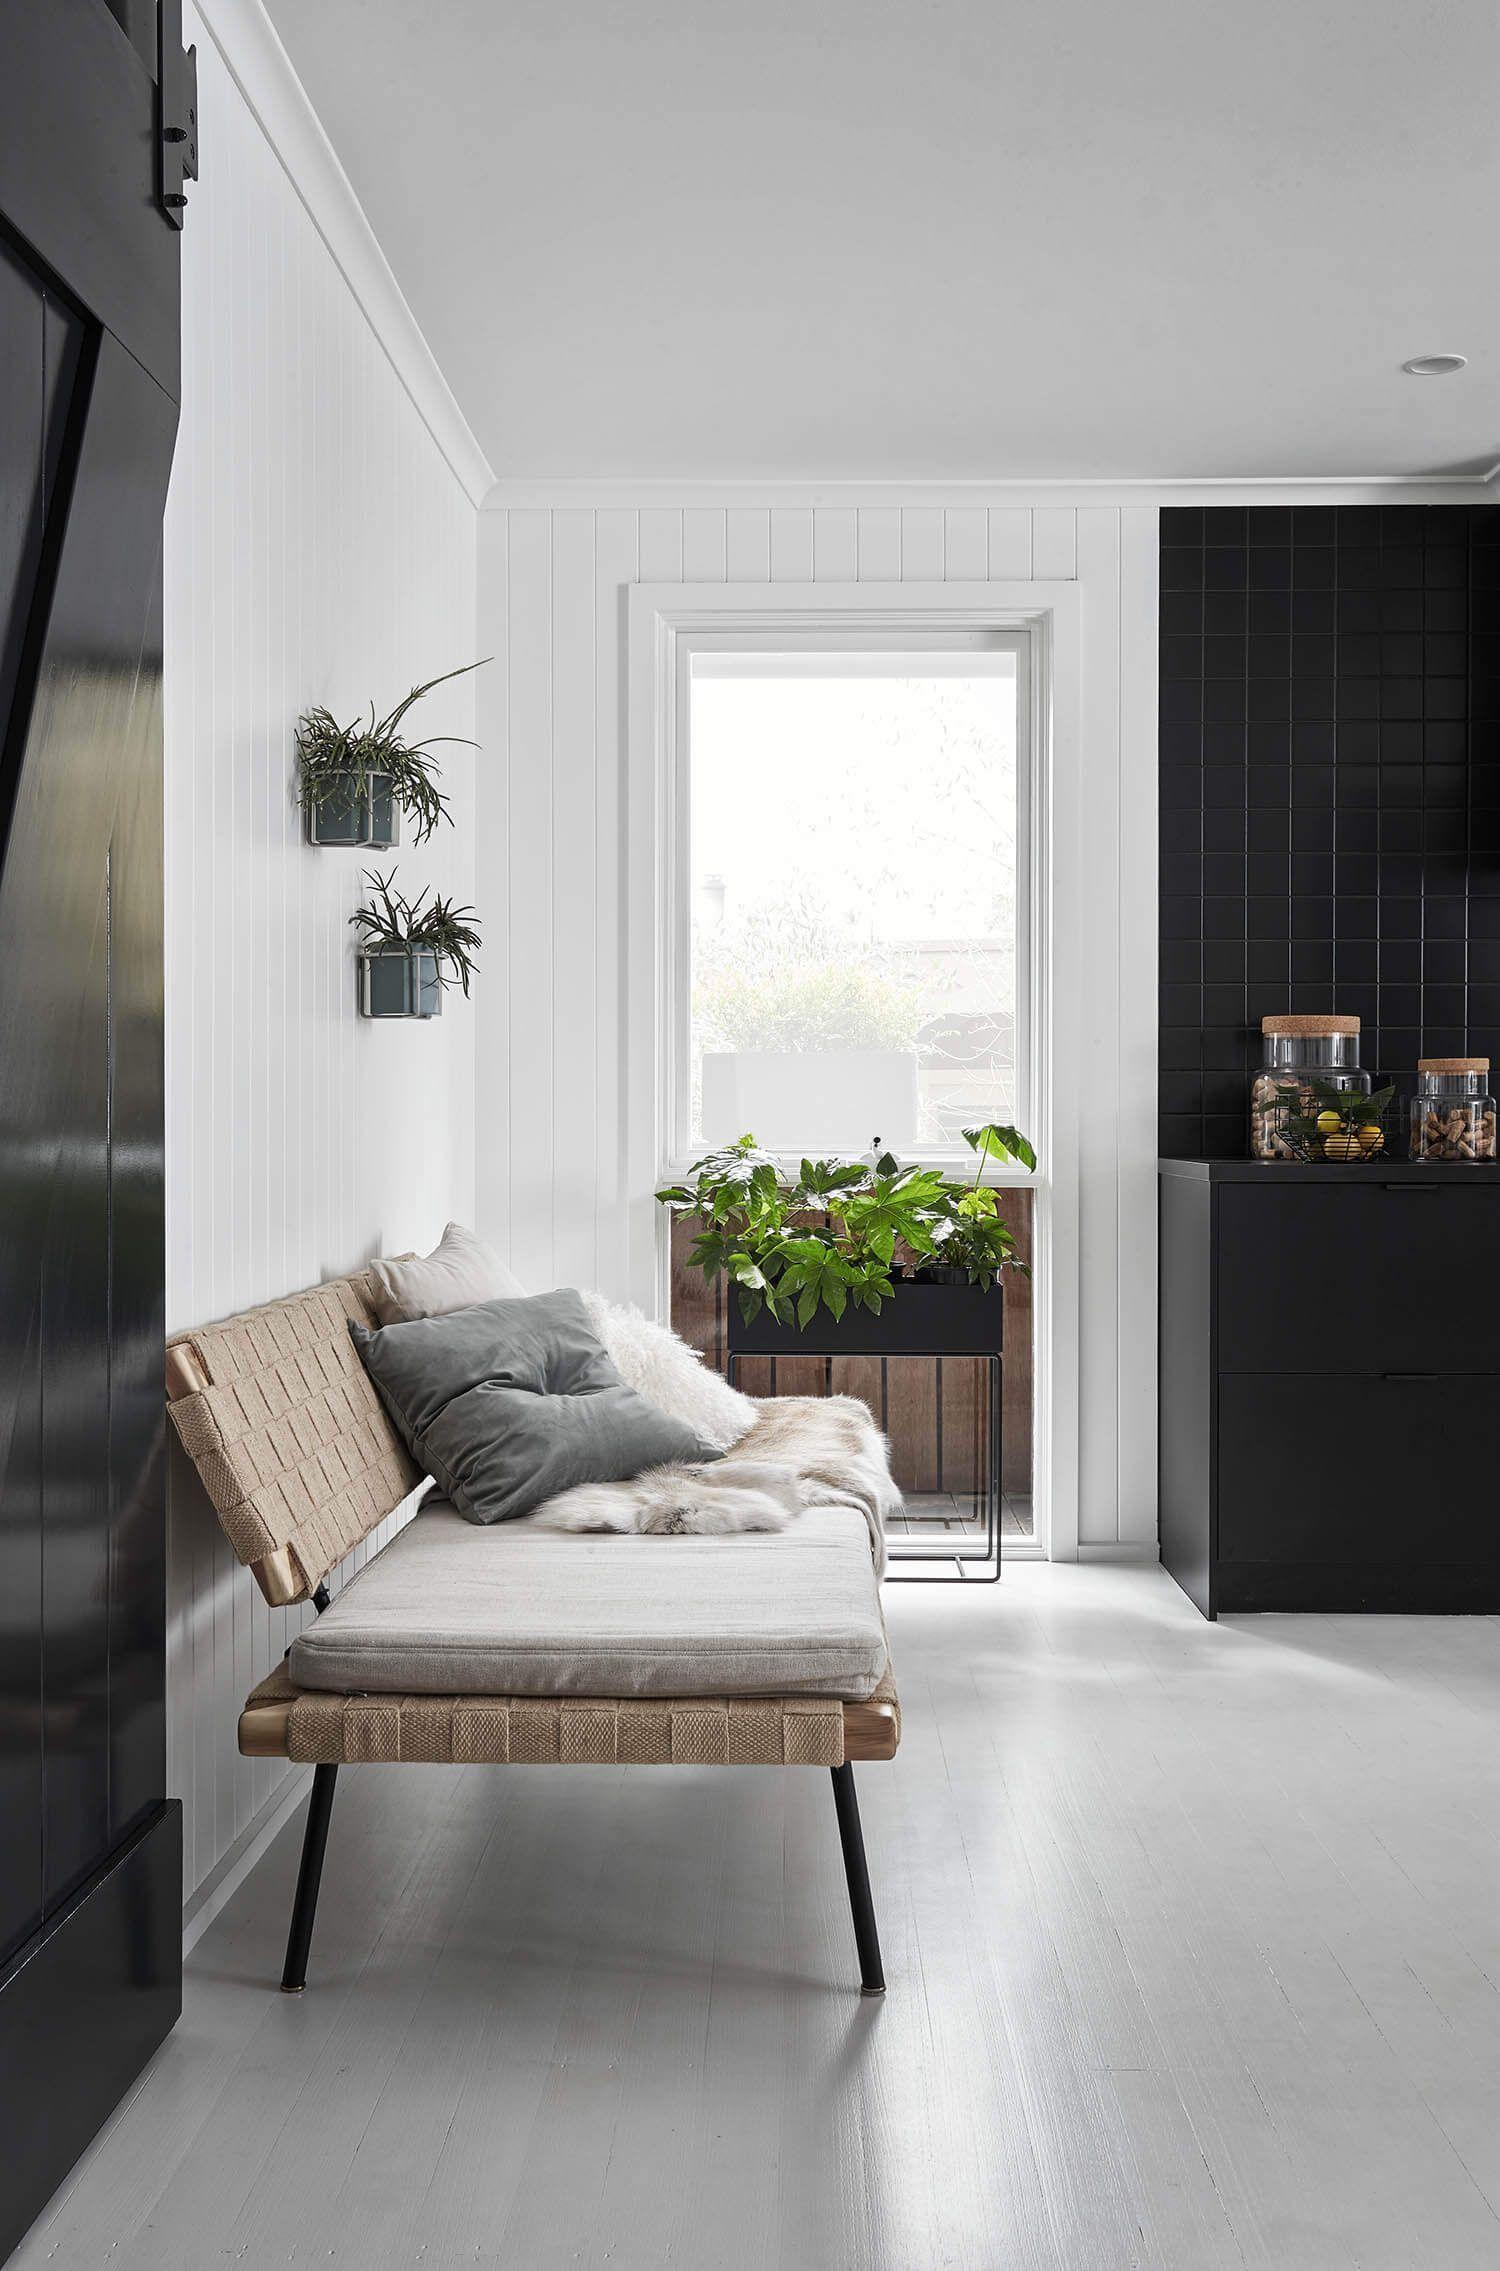 Wonderful cool ideas vintage home decor  chairs boho bedroom designs also rh za pinterest